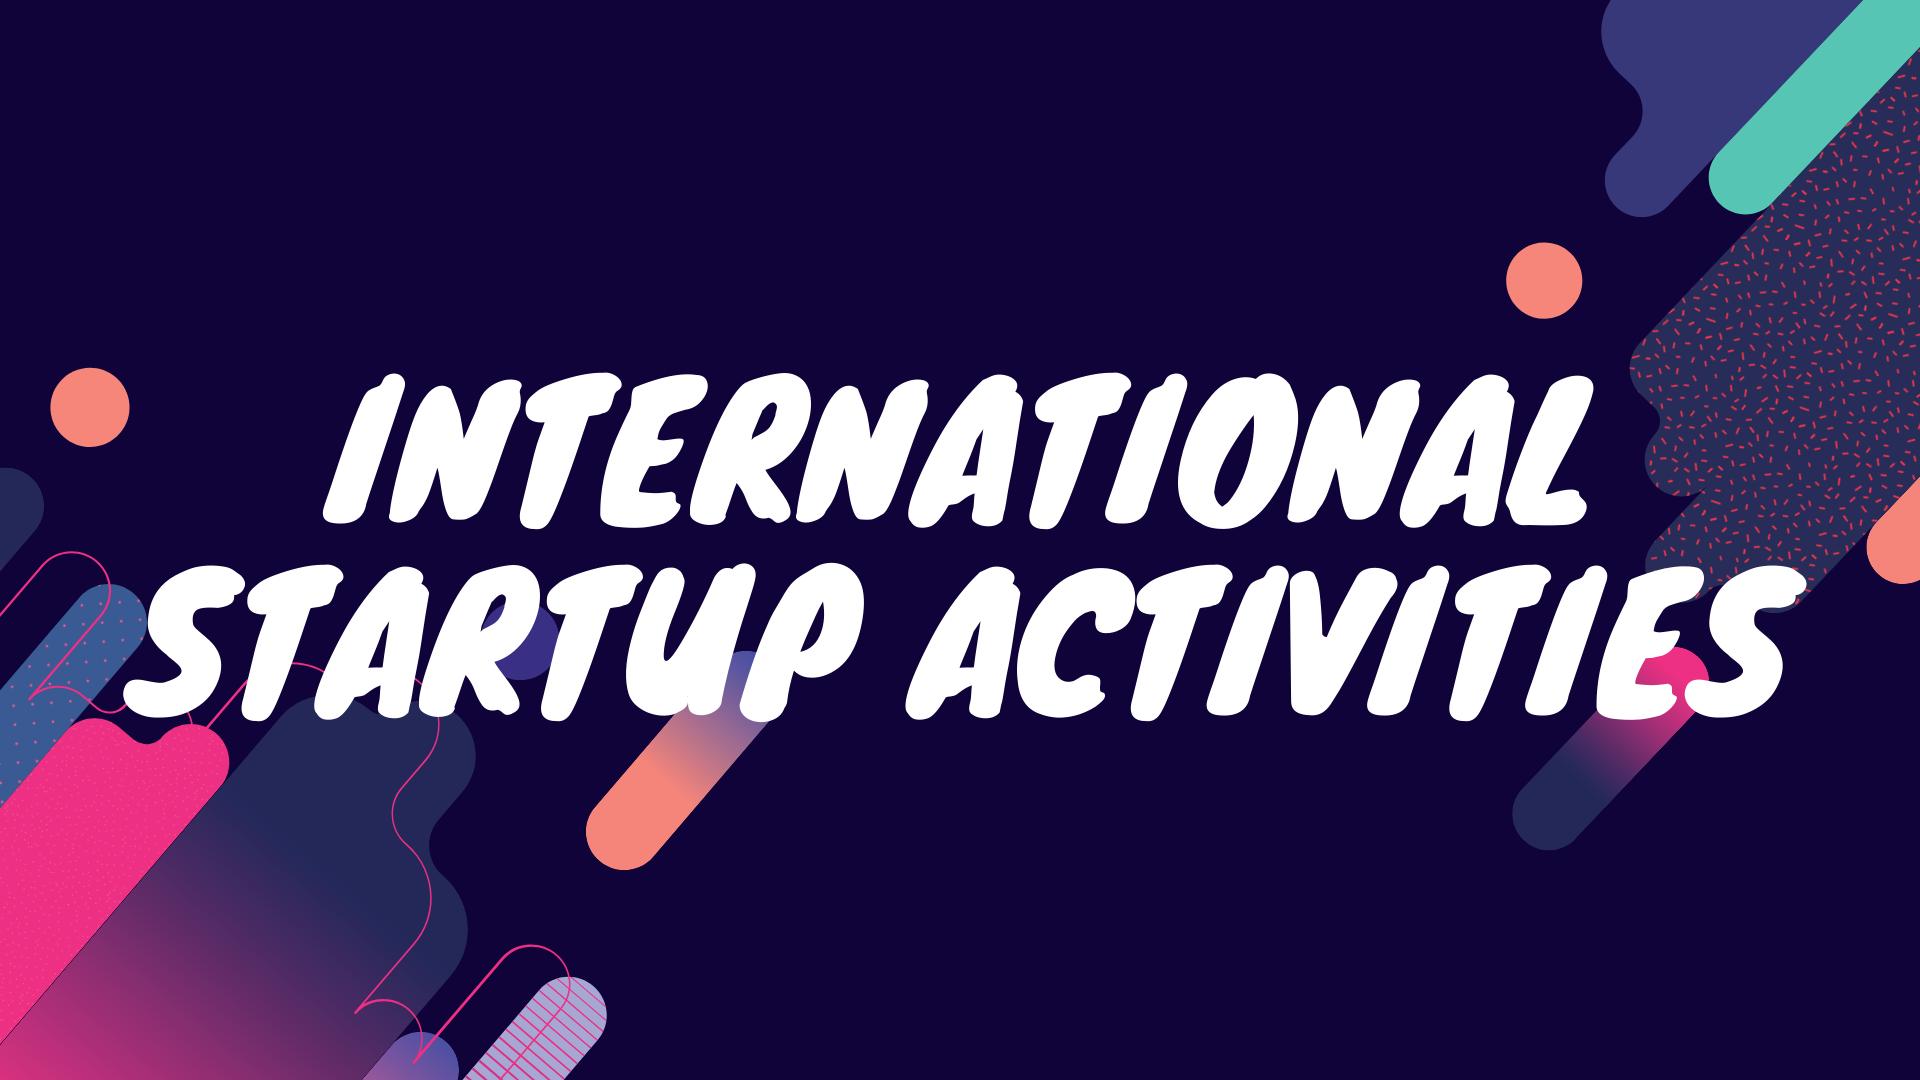 International Startup Activities